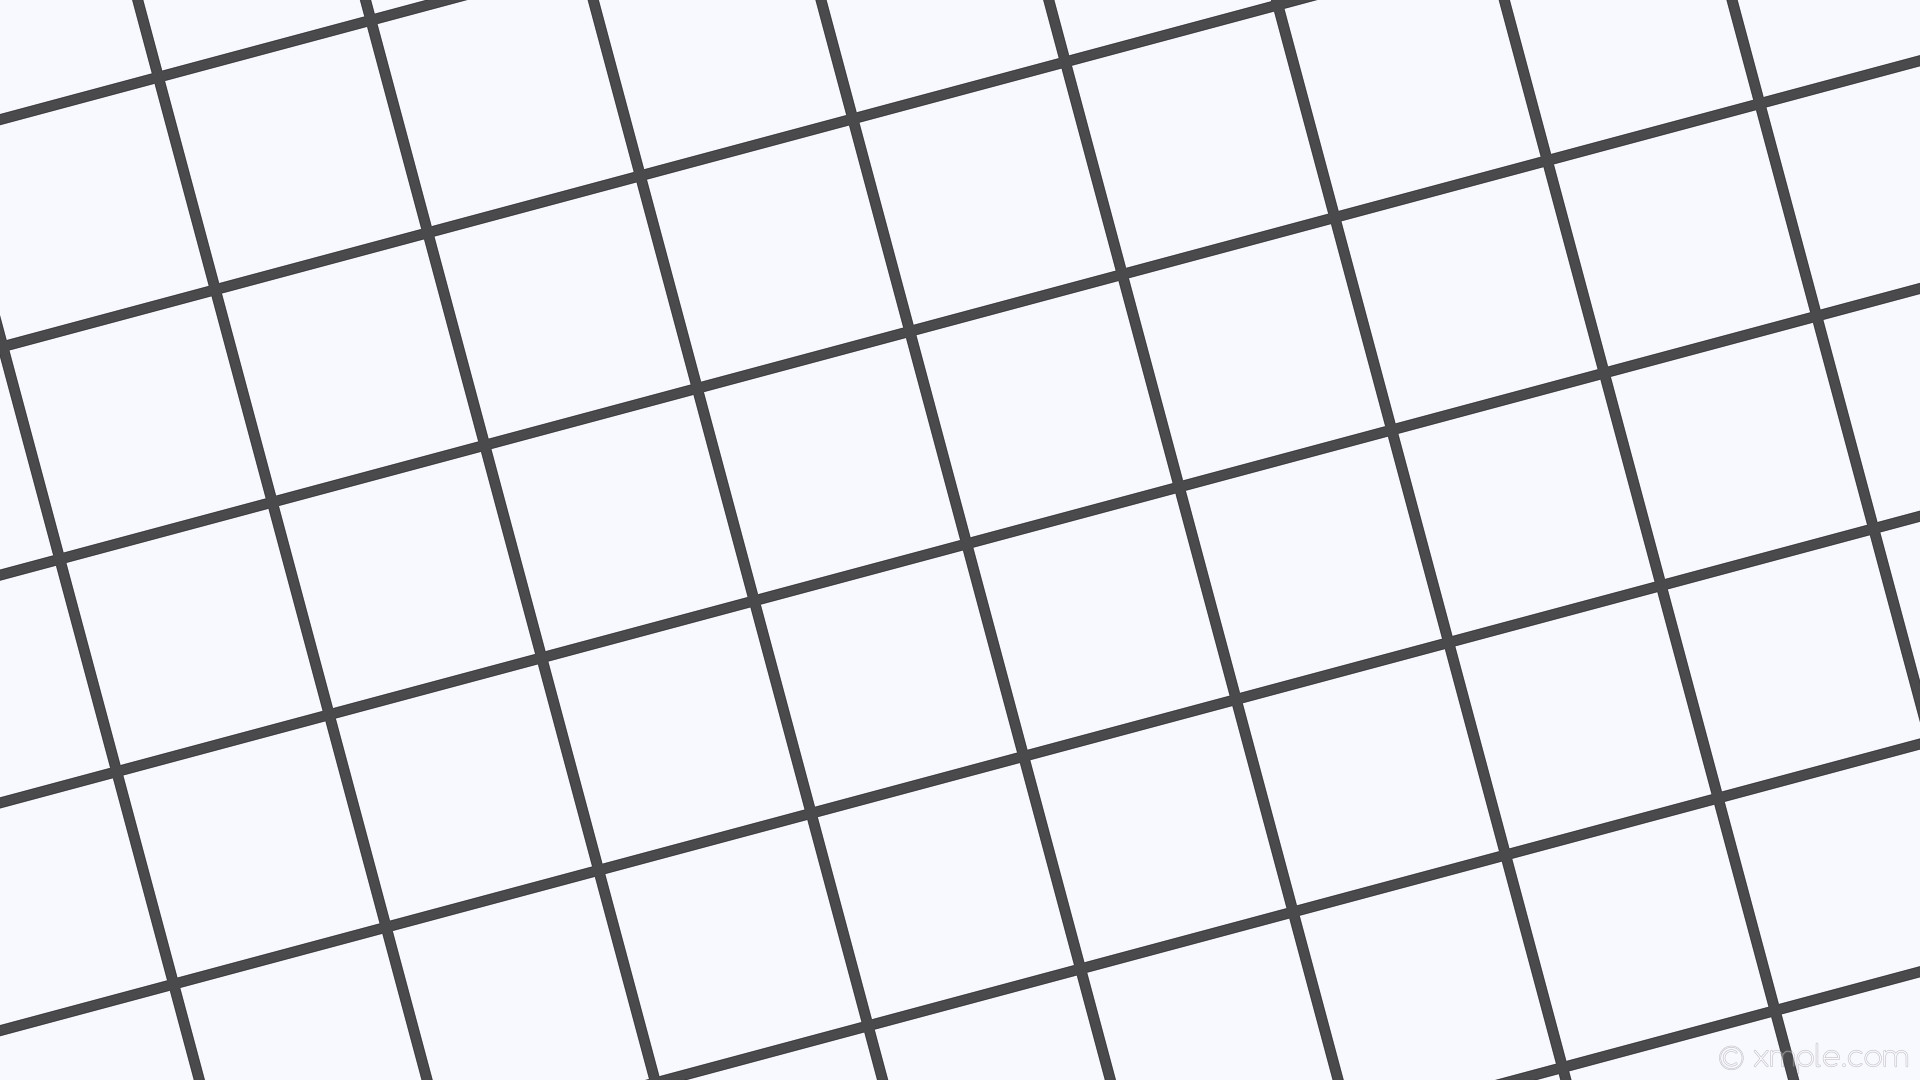 wallpaper graph paper white grid black ghost white #f8f8ff #000000 15° 11px  220px